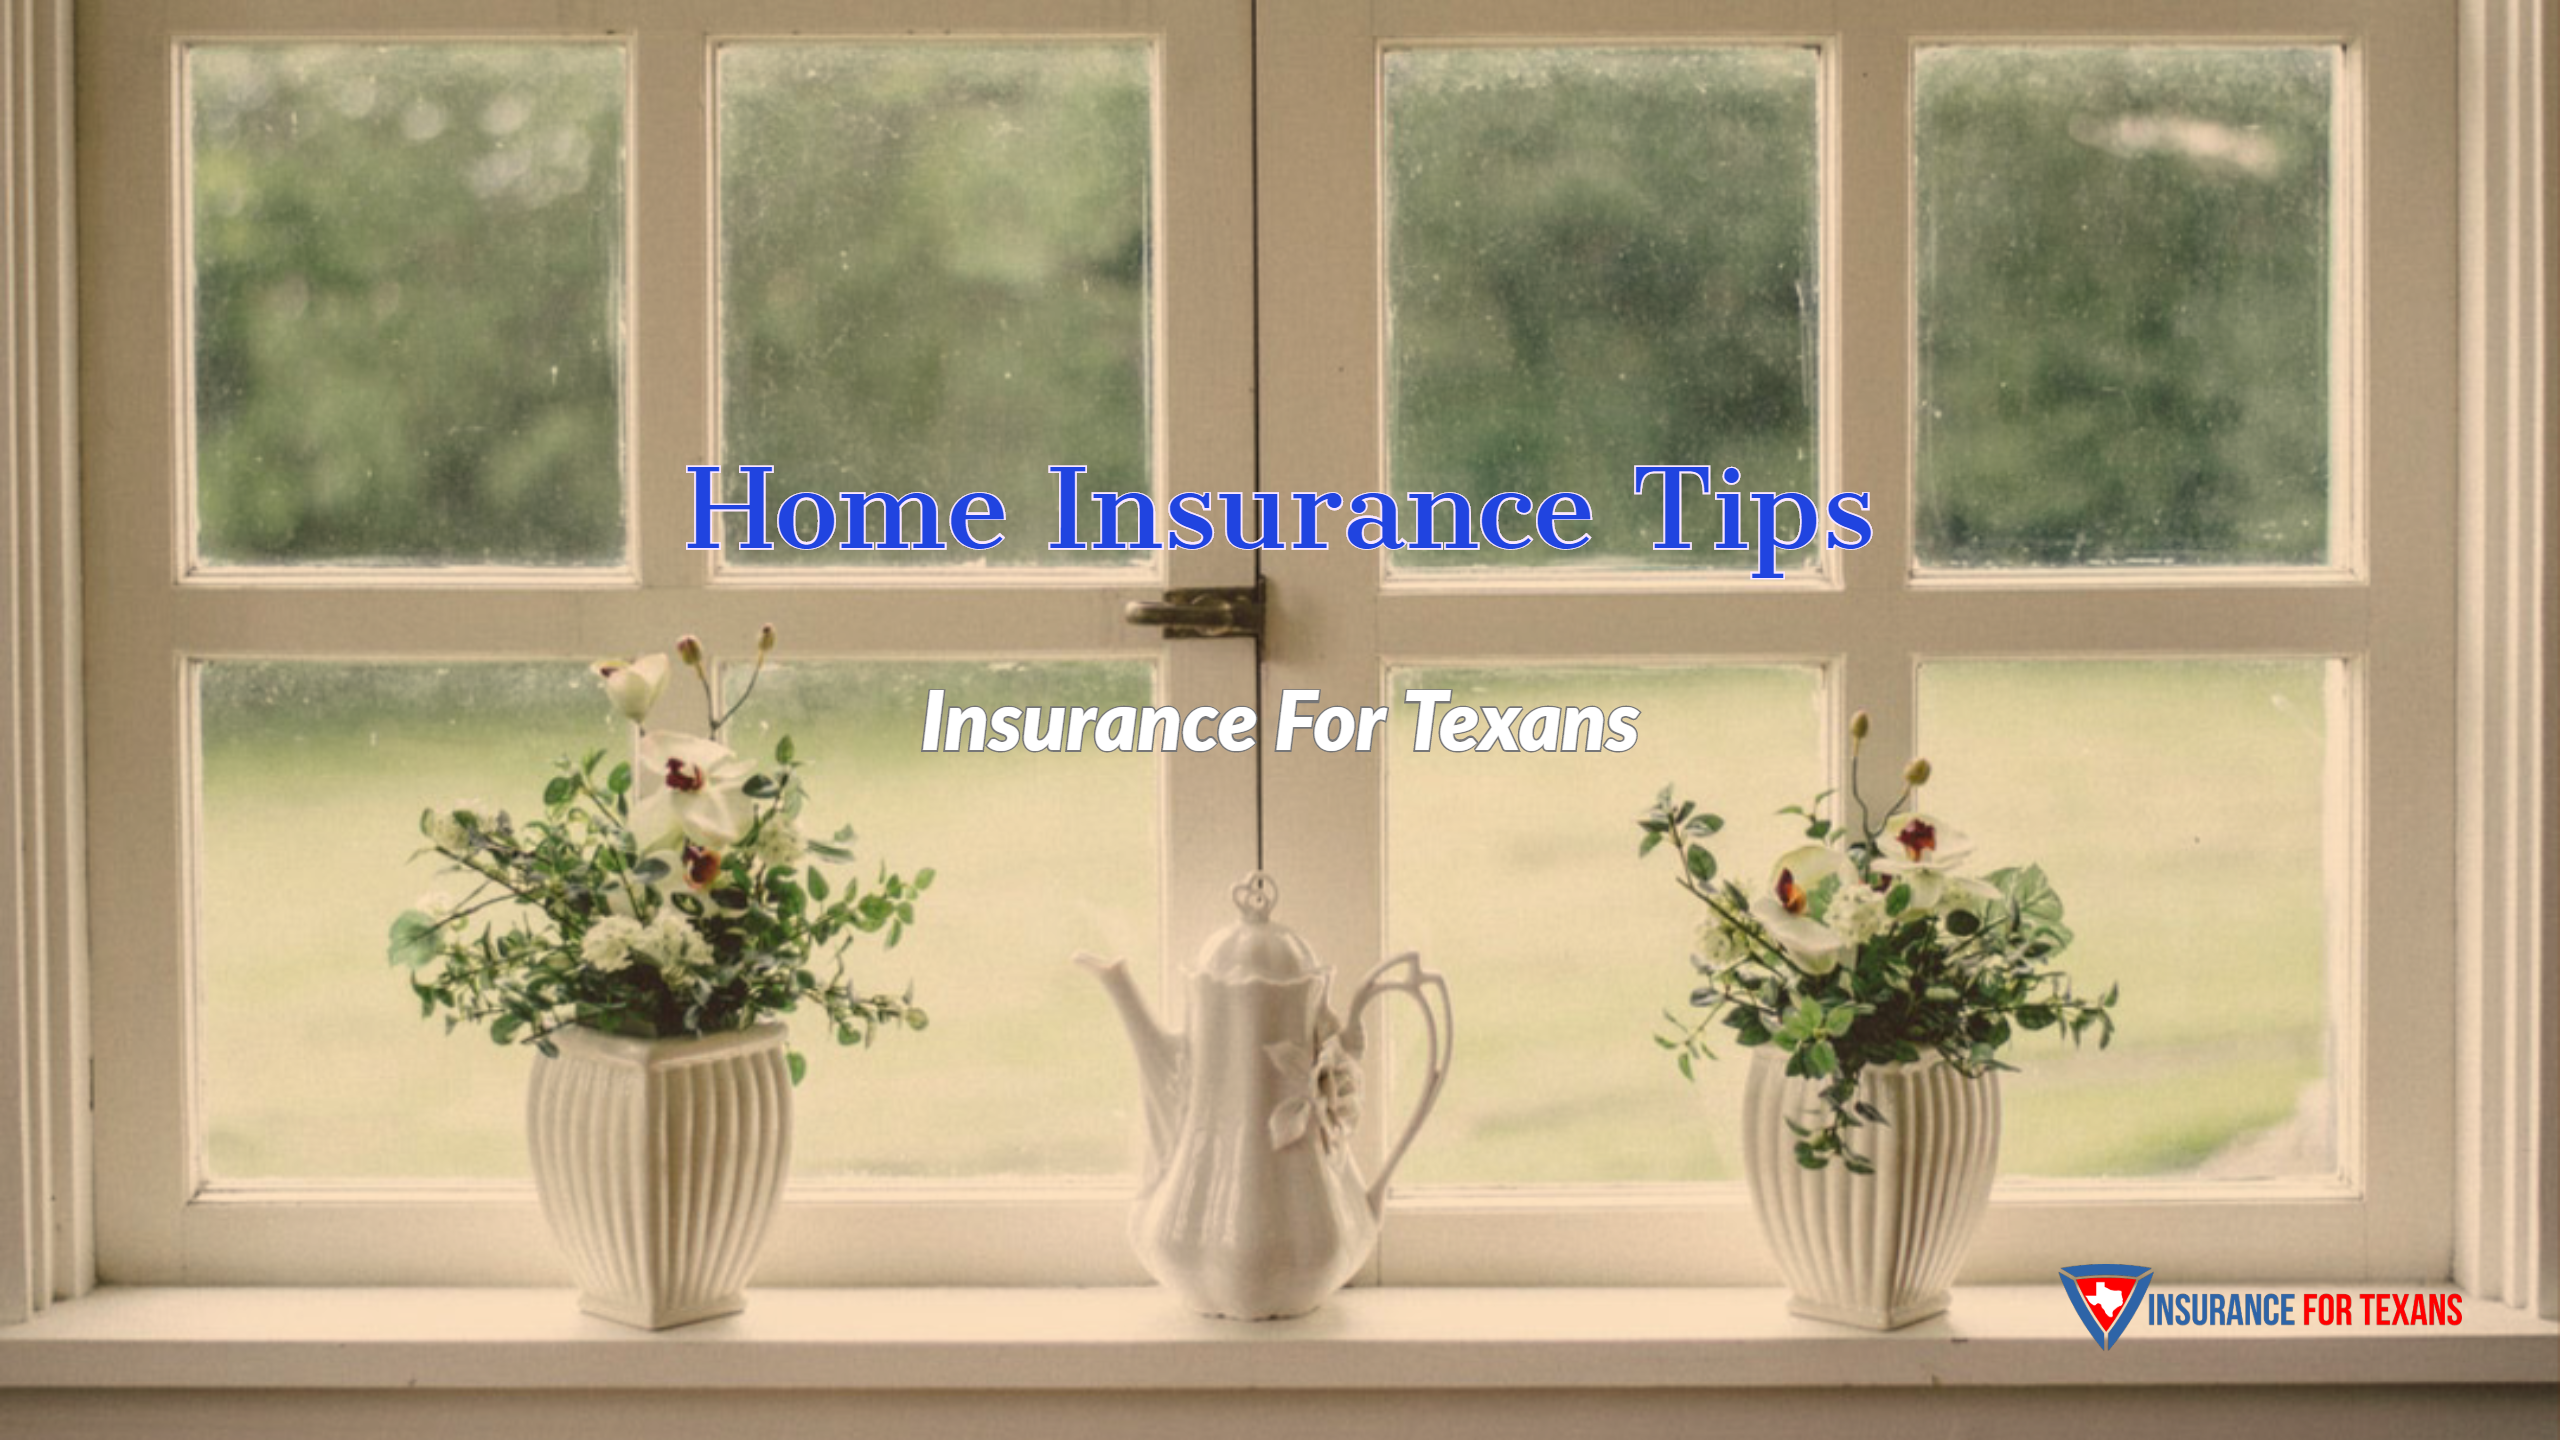 Home Insurance Tips-1